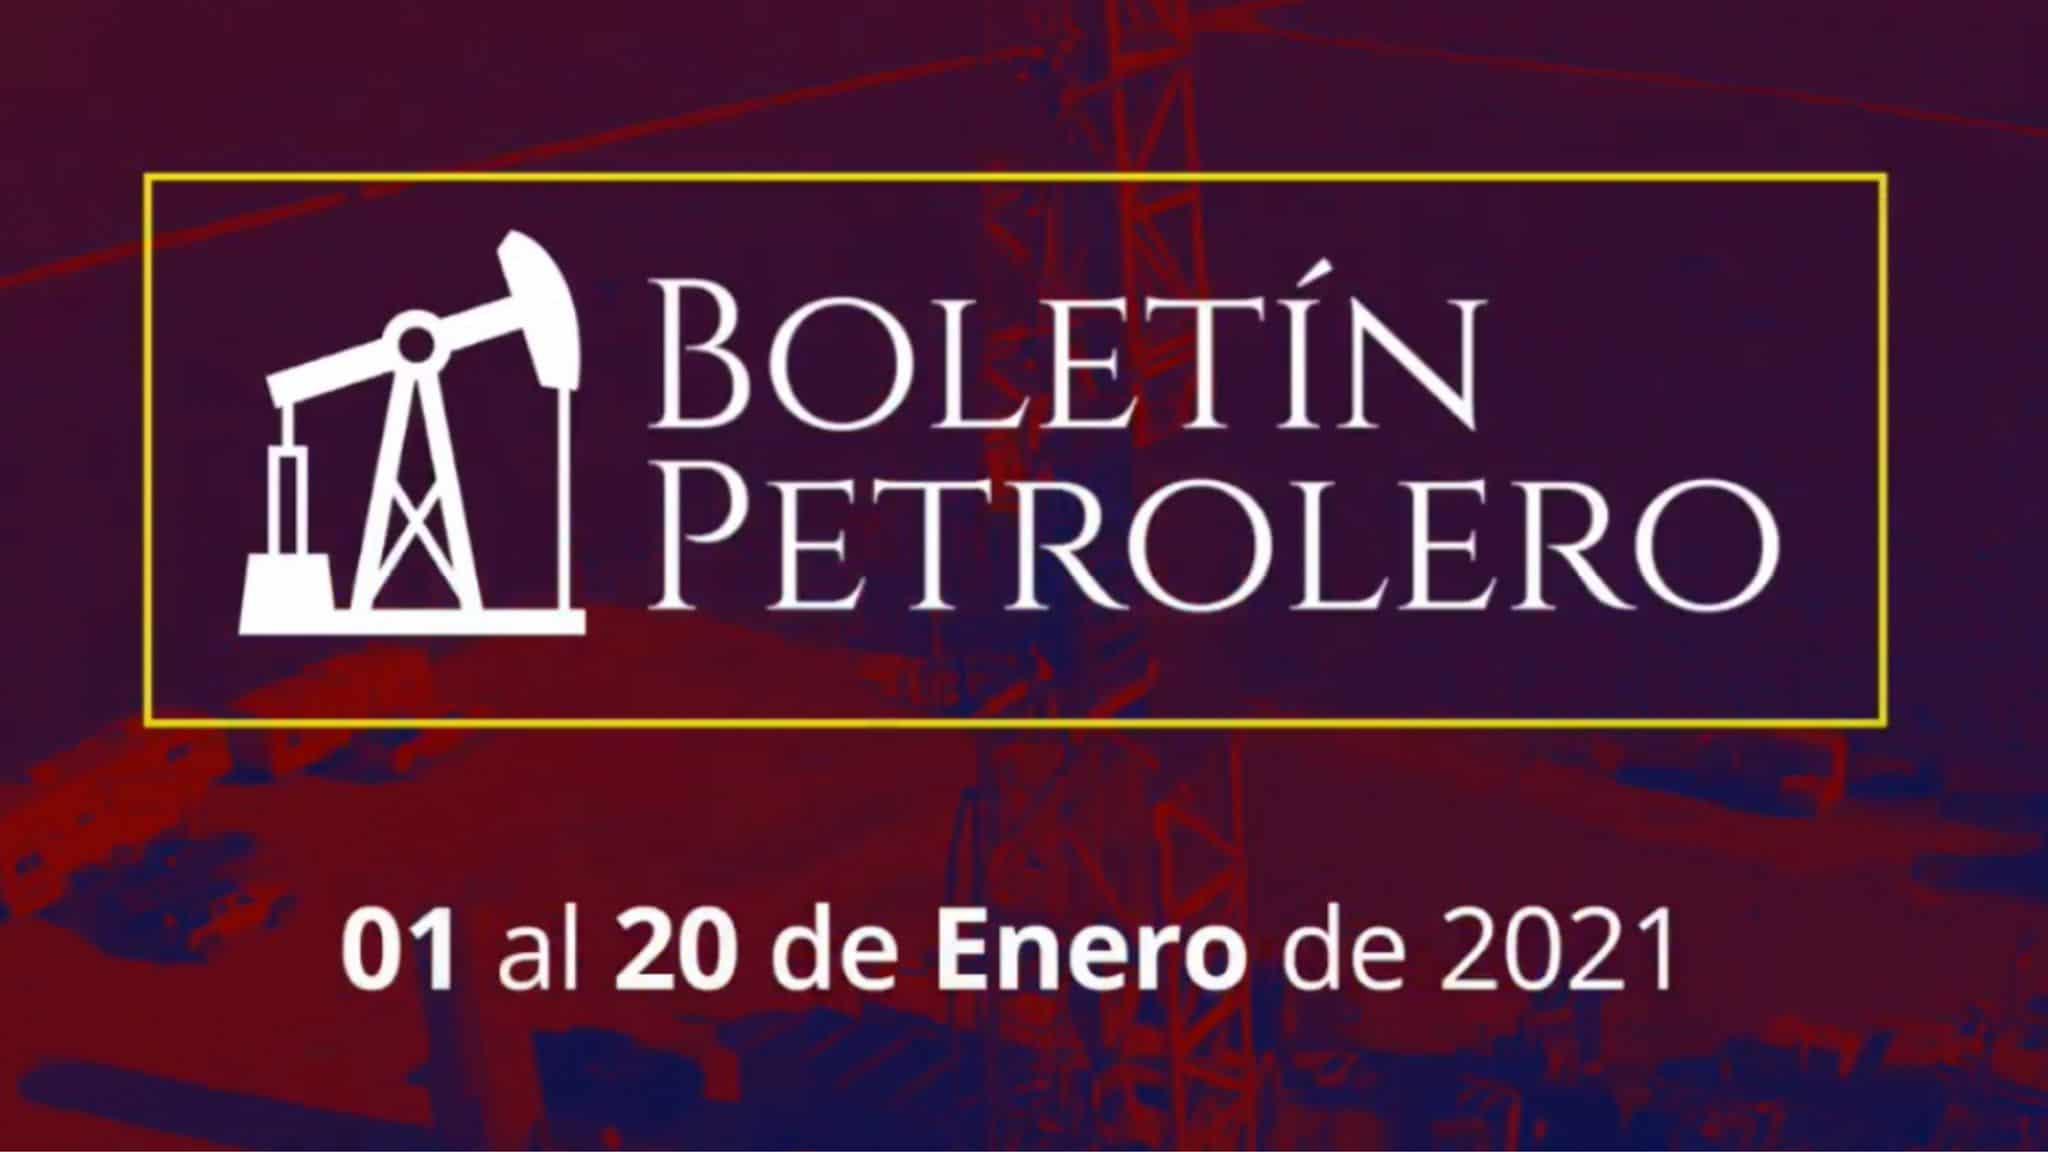 Boletín Petrolero – 01 al 20 de Enero 2021